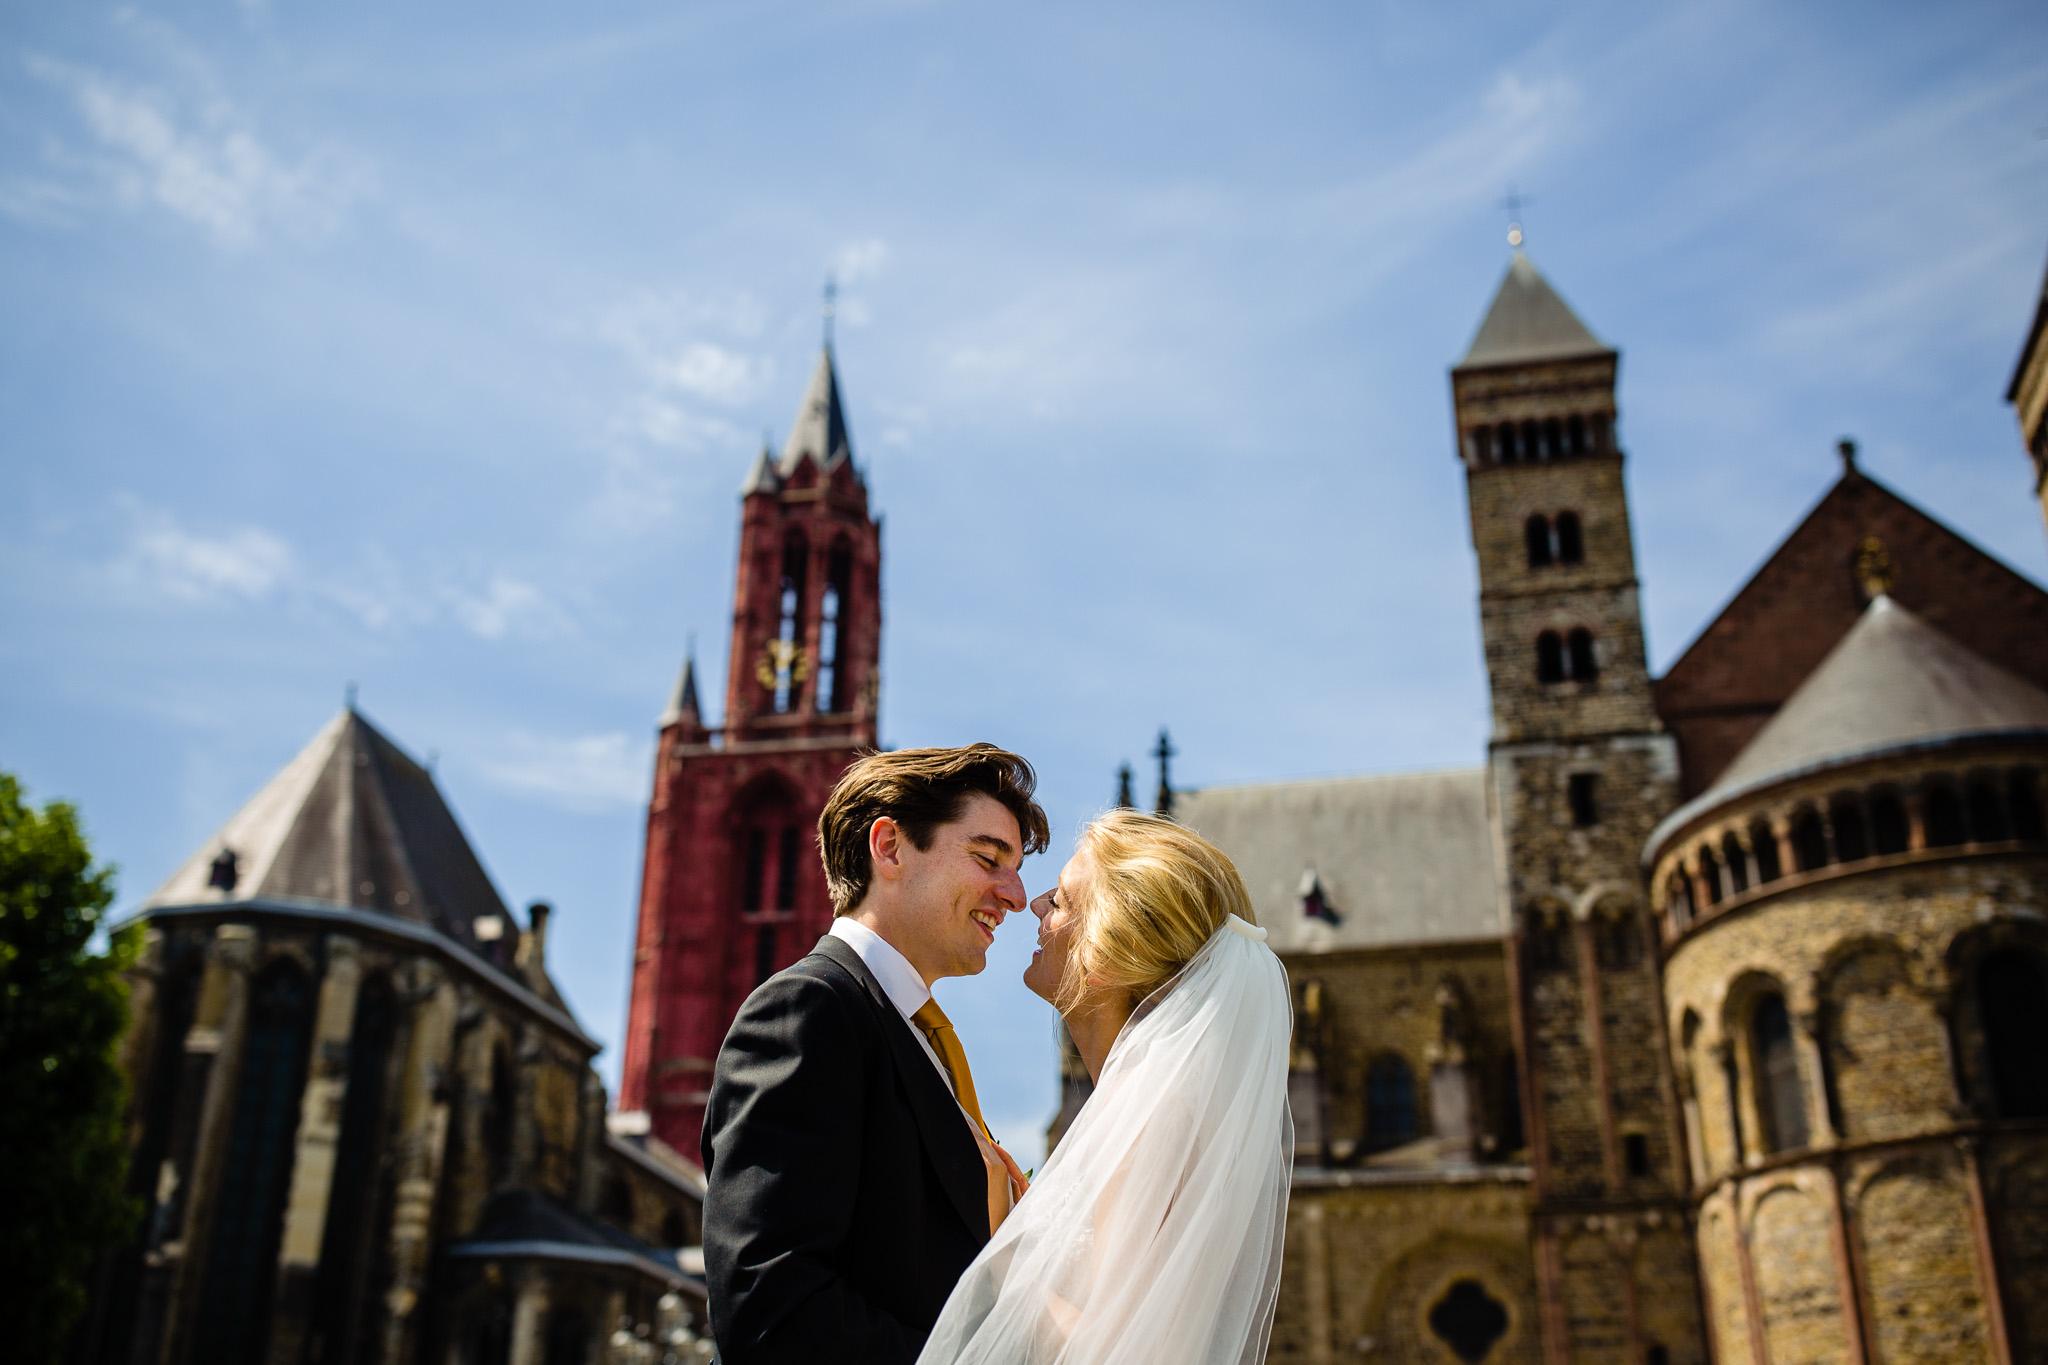 Bruiloft Vaeshartelt Maastricht